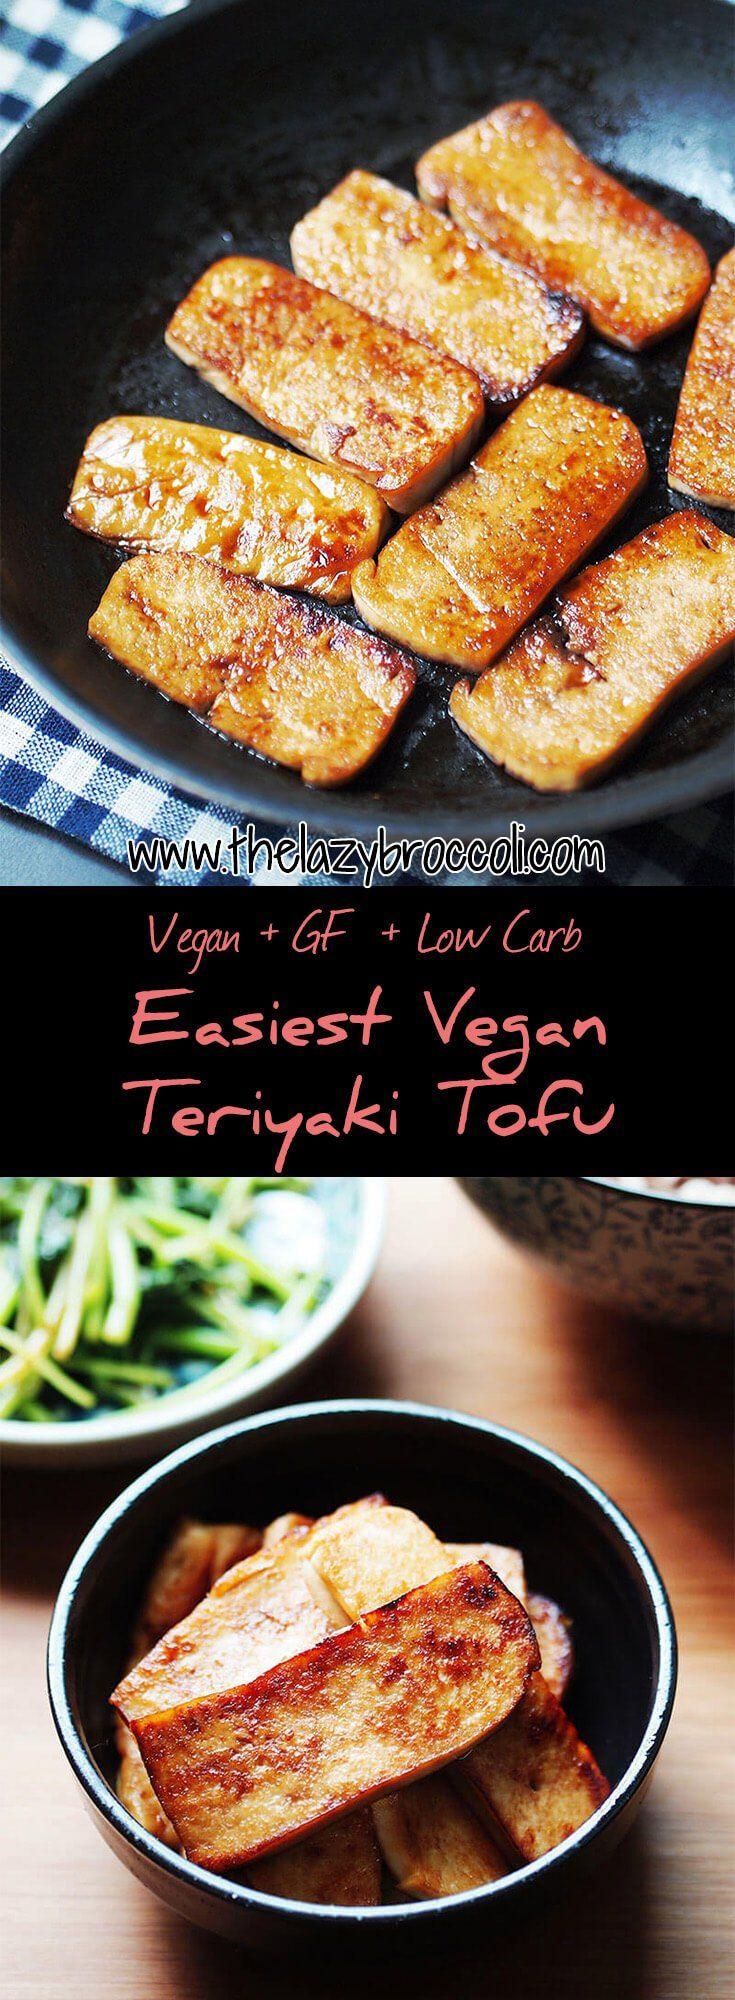 This teriyaki tofu requires only 5 ingredients, 1 pan, and 15 minutes! It's super easy yet it's soooo delicious! #vegan #vegetarian #tofu #teriyaki #lowcarb #protein #glutenfree #noonionnogarlic #asian #japanese #recipe